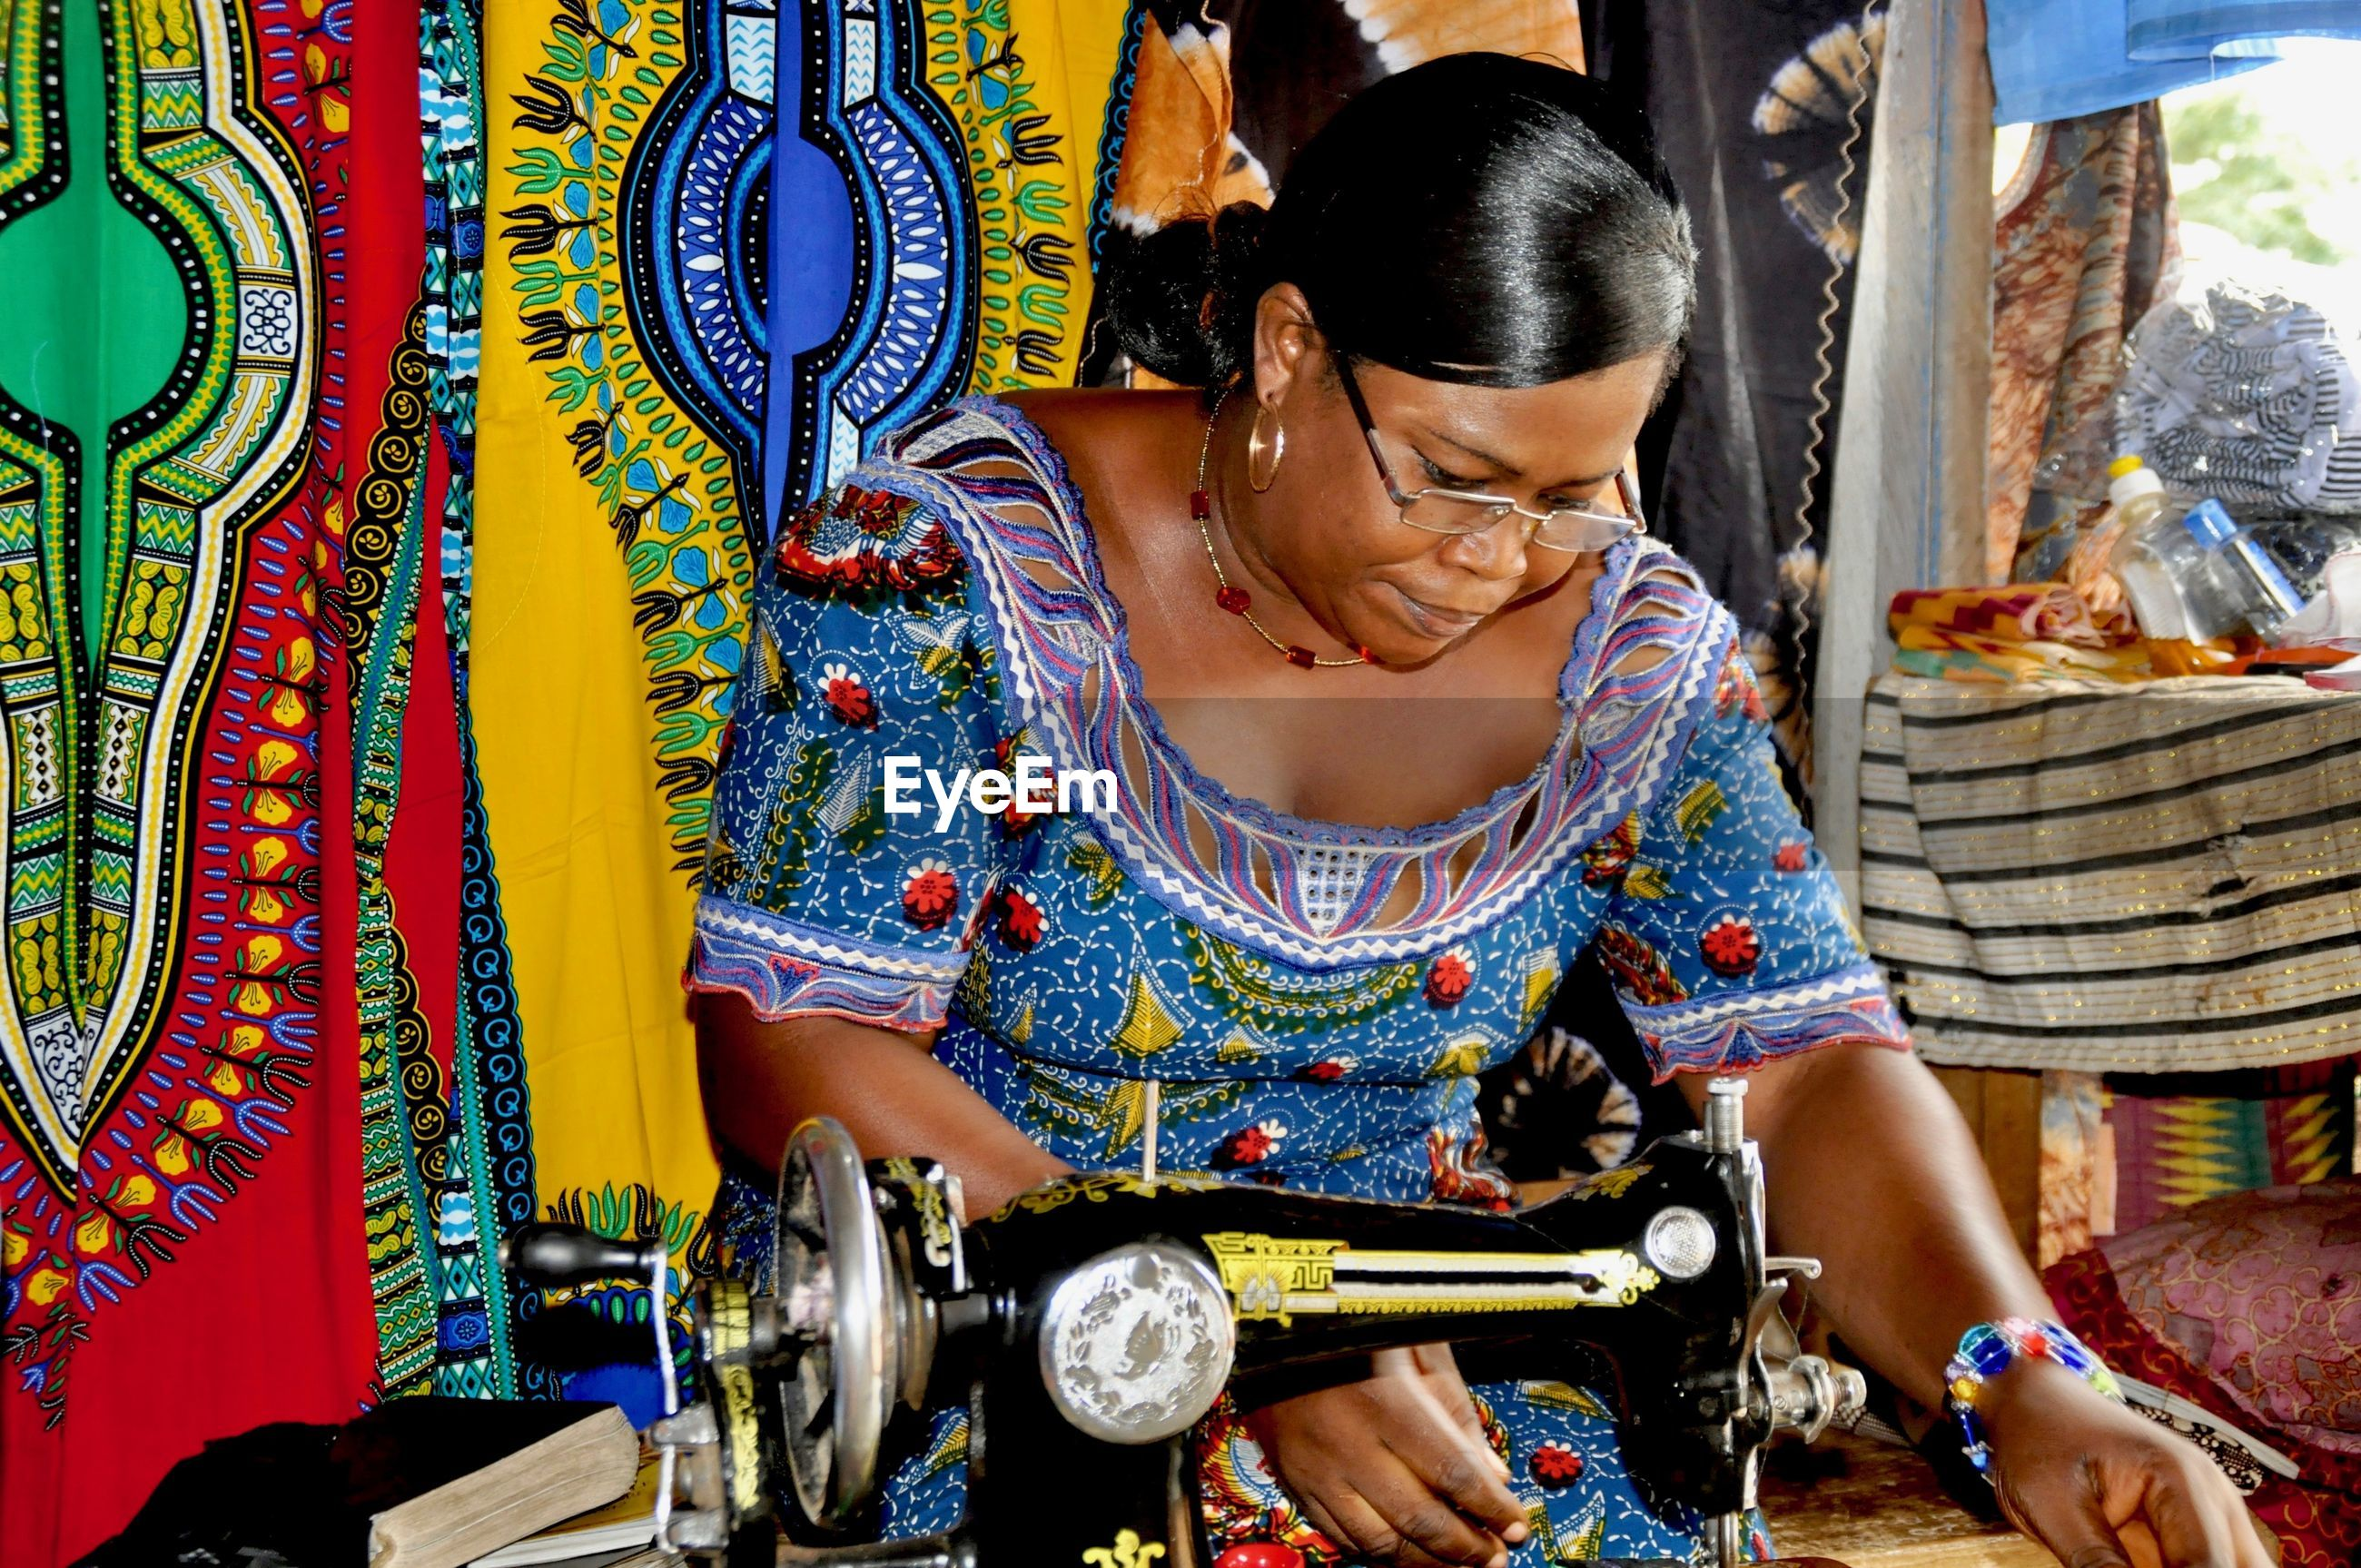 Woman stitching in workshop